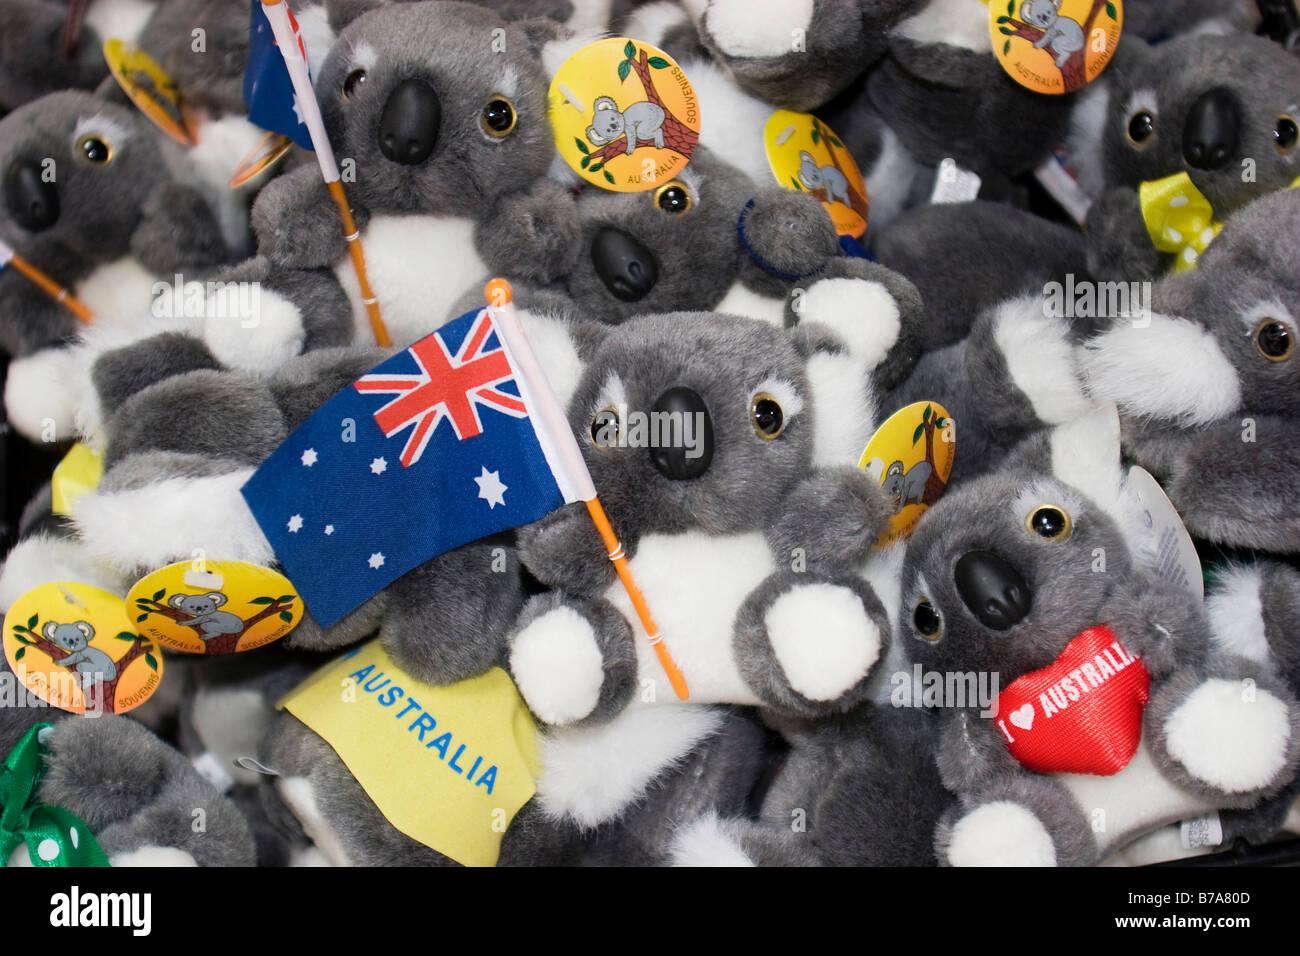 Koala bears stuffed toys souvenirs Australia Stock Photo